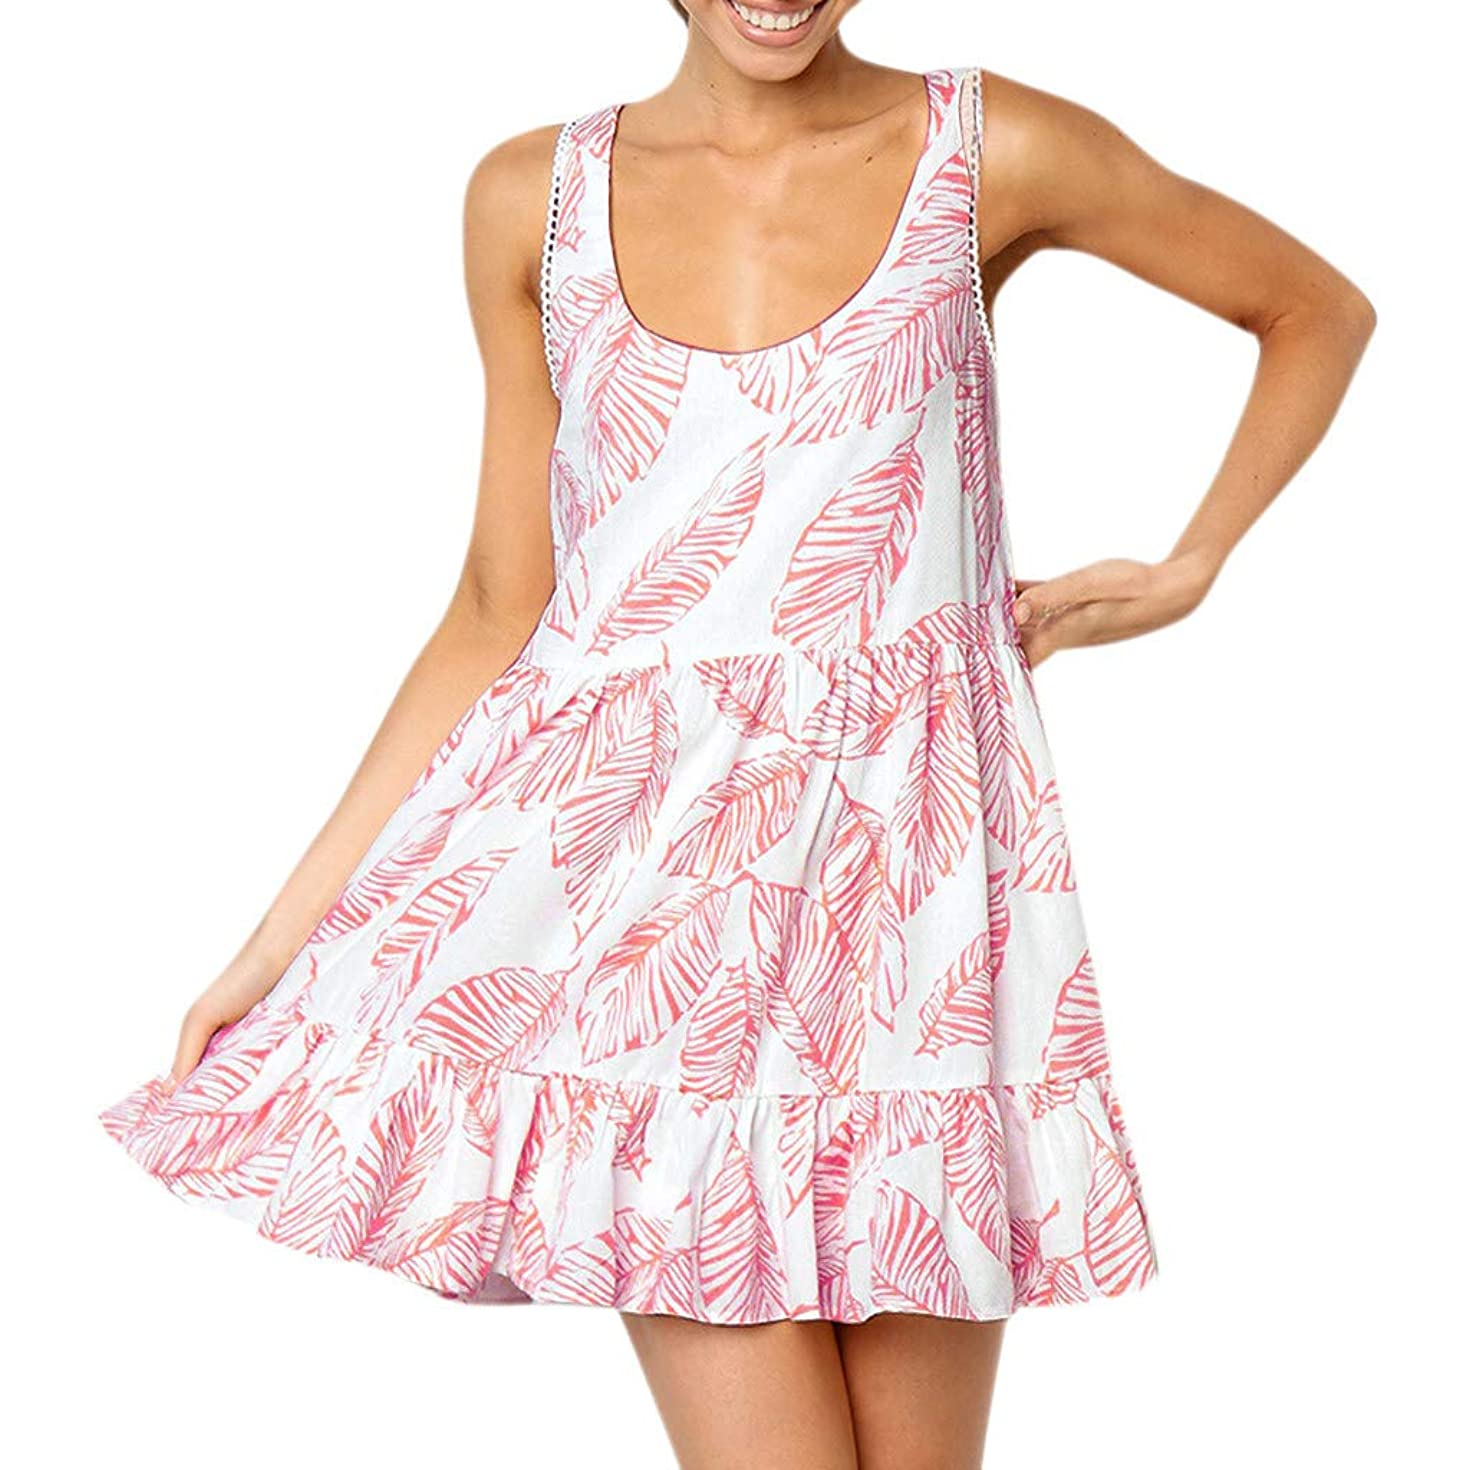 Franterd Women Mini Dress Summer Bohemian Leaves Off Shoulder Casual Sleeveless Vest Dress Beach Cover up Sundress